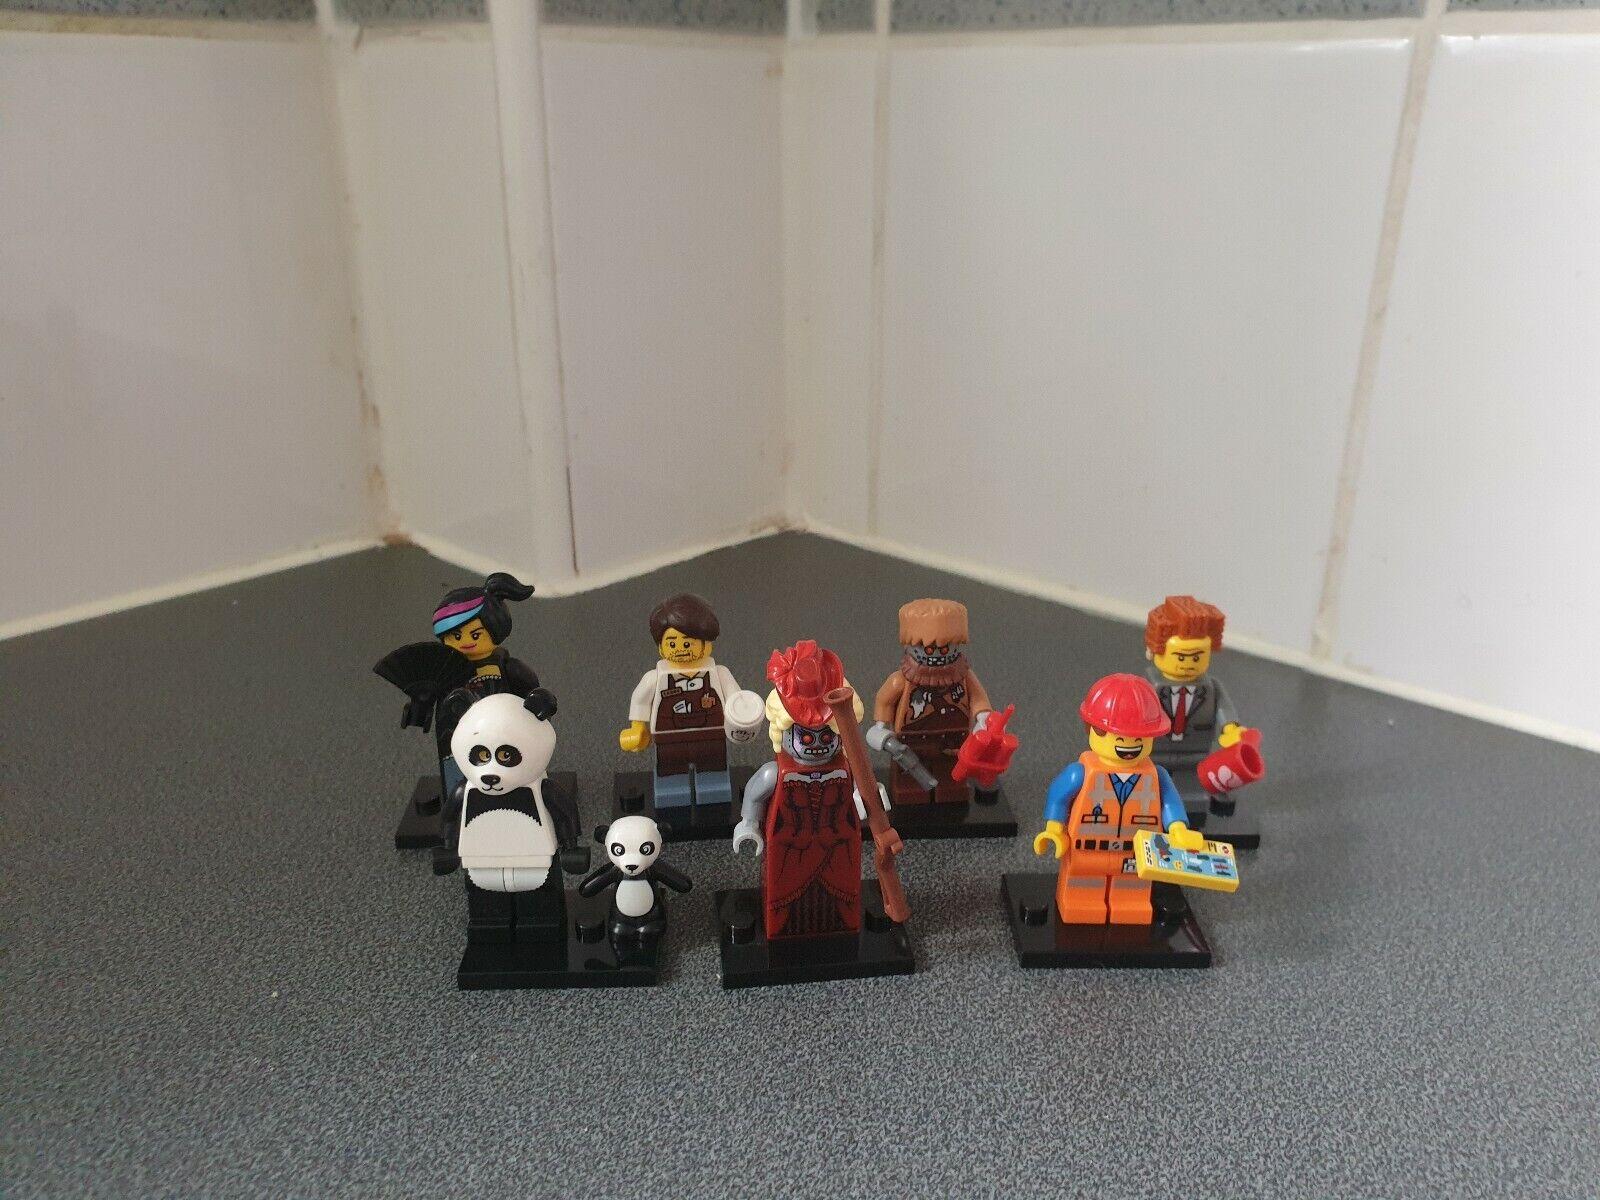 Film  LEGO 1 Minifigures Calamity Emmet Wild Style Lord Affaires Panda Larry  vente directe d'usine